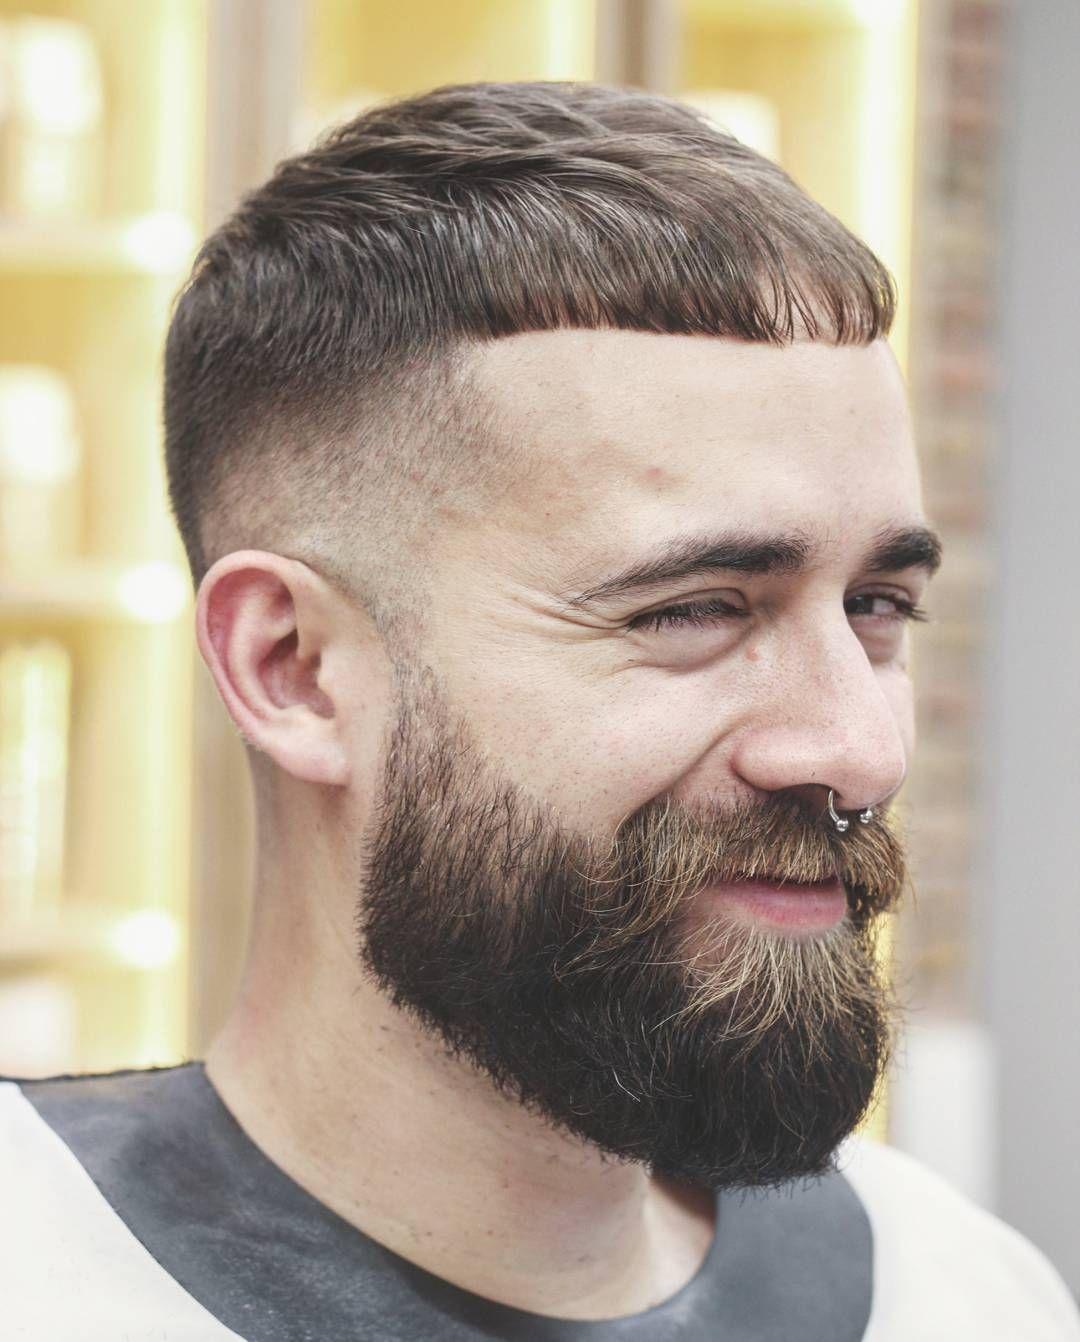 22 Stylish Haircuts For Men 2021 Trends Caesar Haircut Mens Hairstyles Short Haircuts For Men